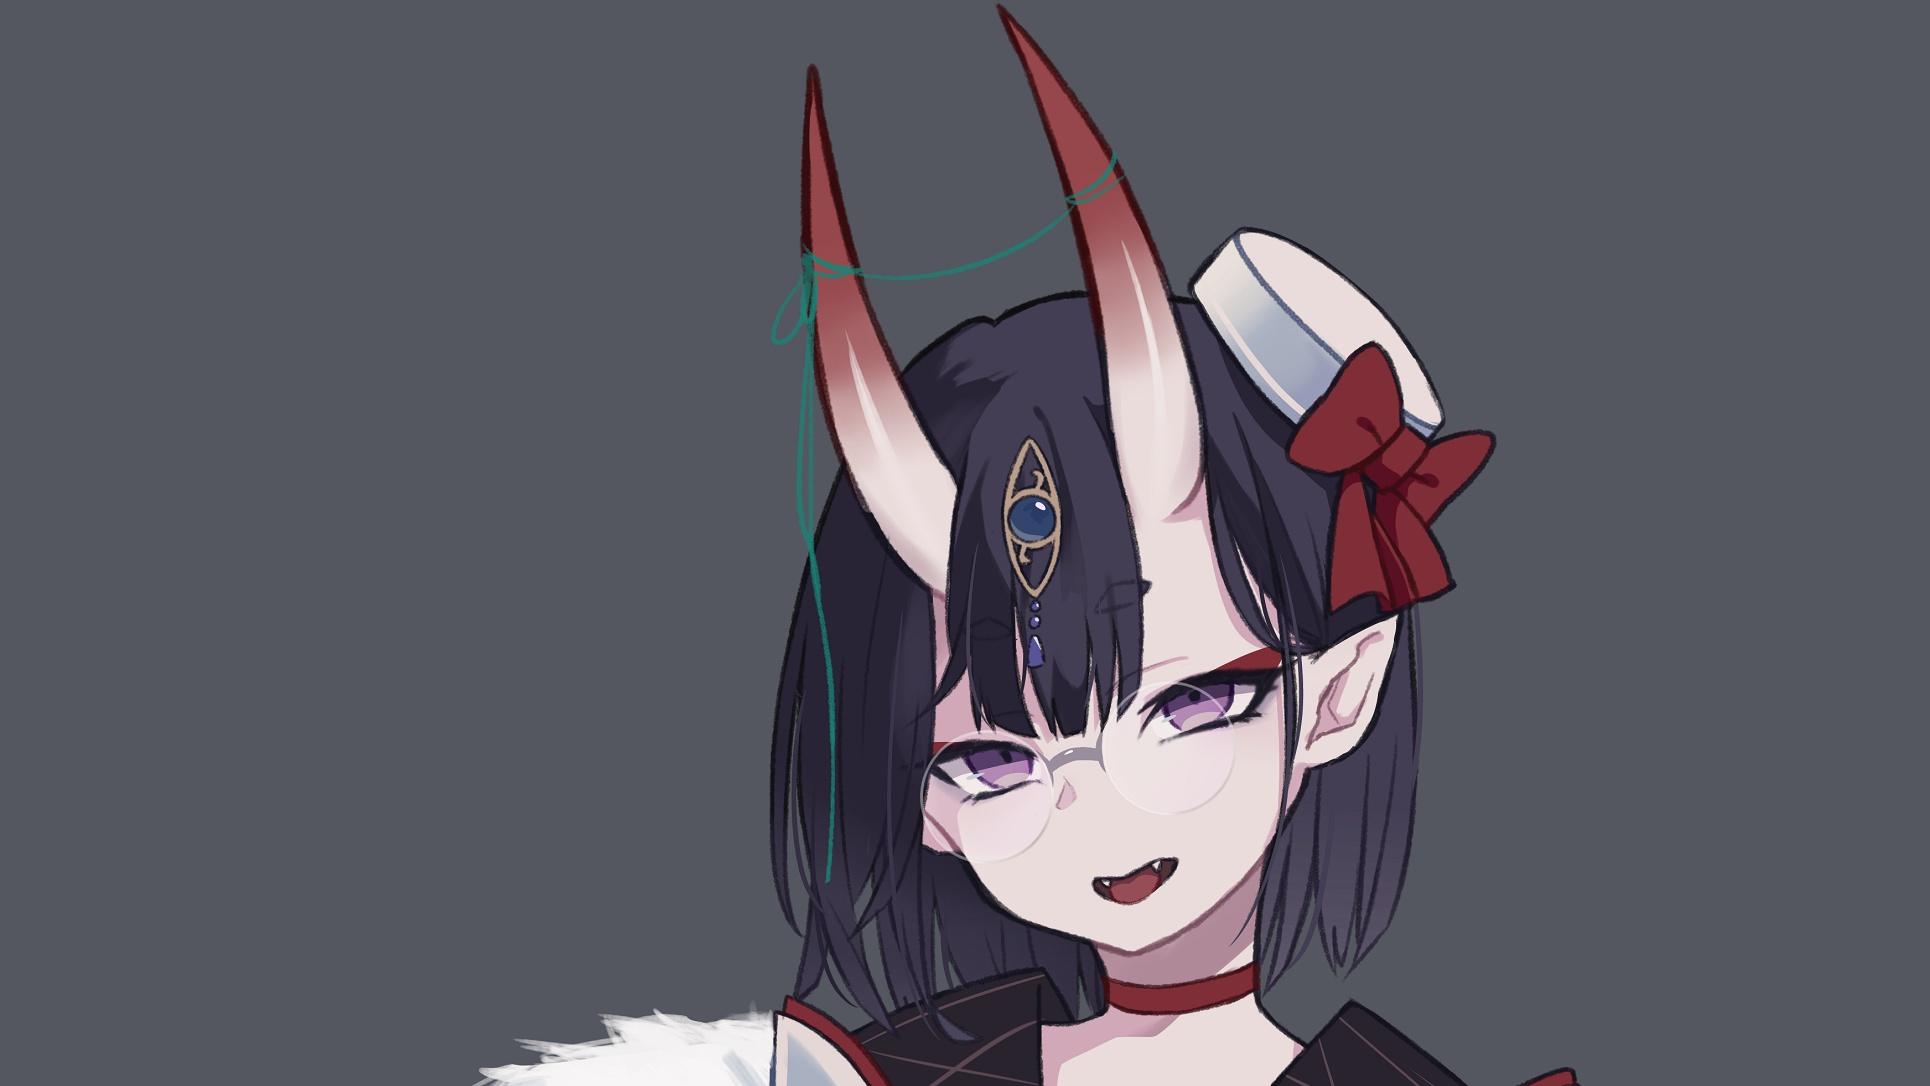 Картинки девушка аниме с рогами